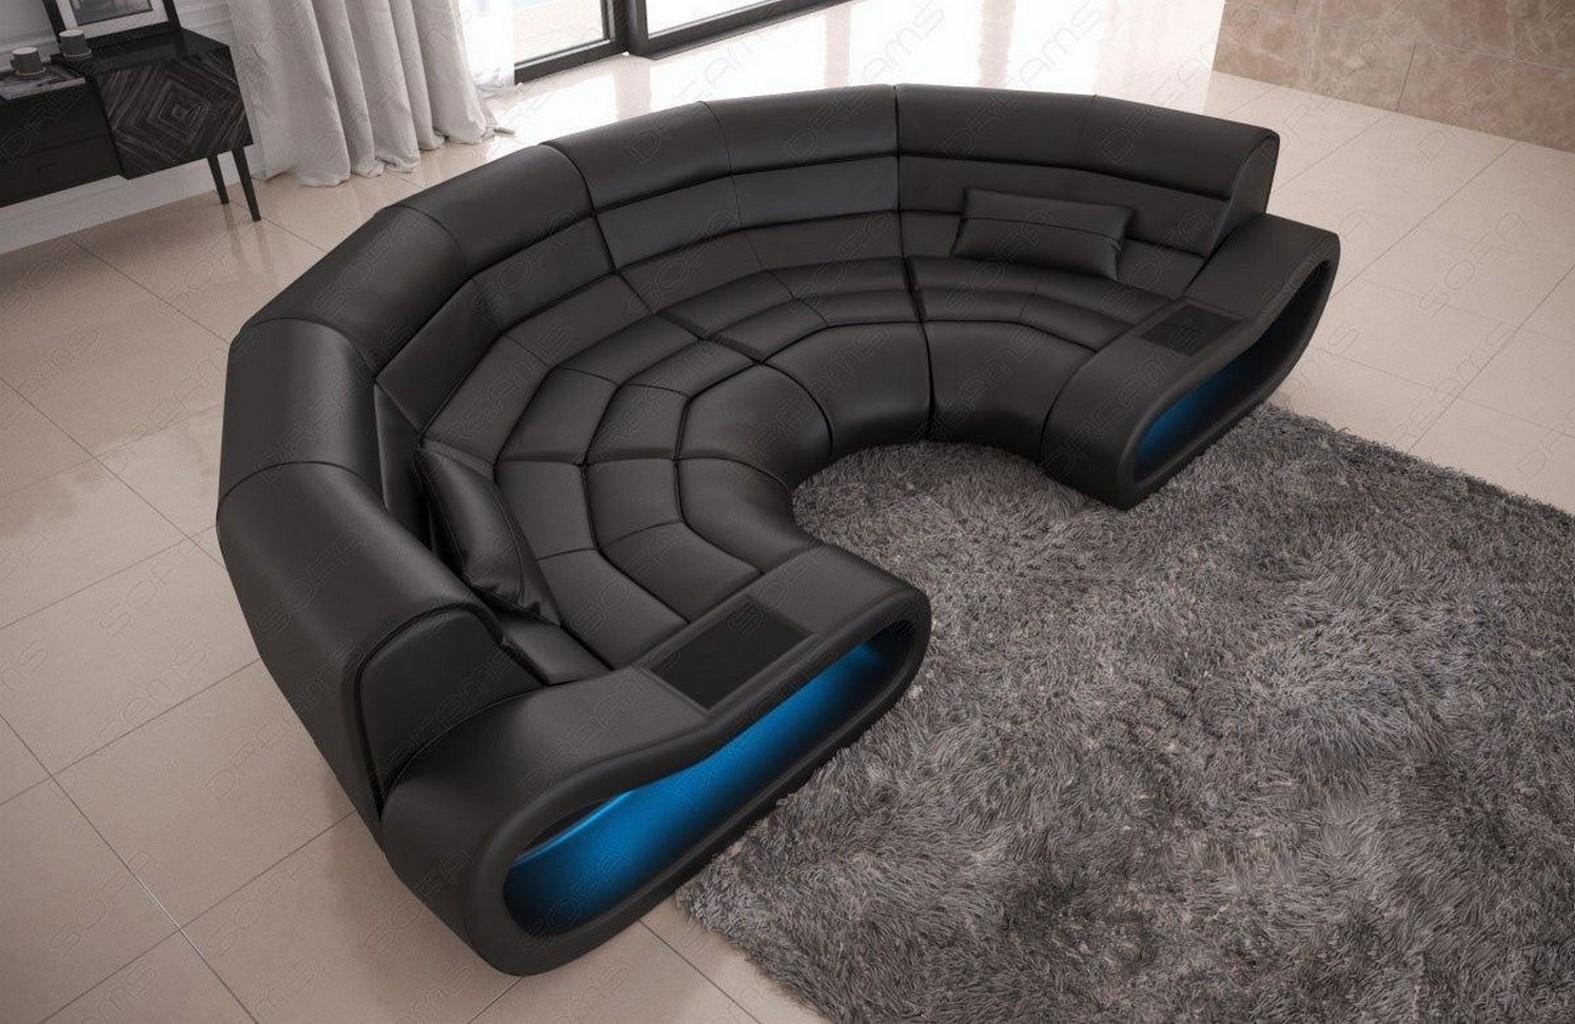 leder sofa bigsofa design couch eckcouch concept u form beleuchtung rund schwarz ebay. Black Bedroom Furniture Sets. Home Design Ideas